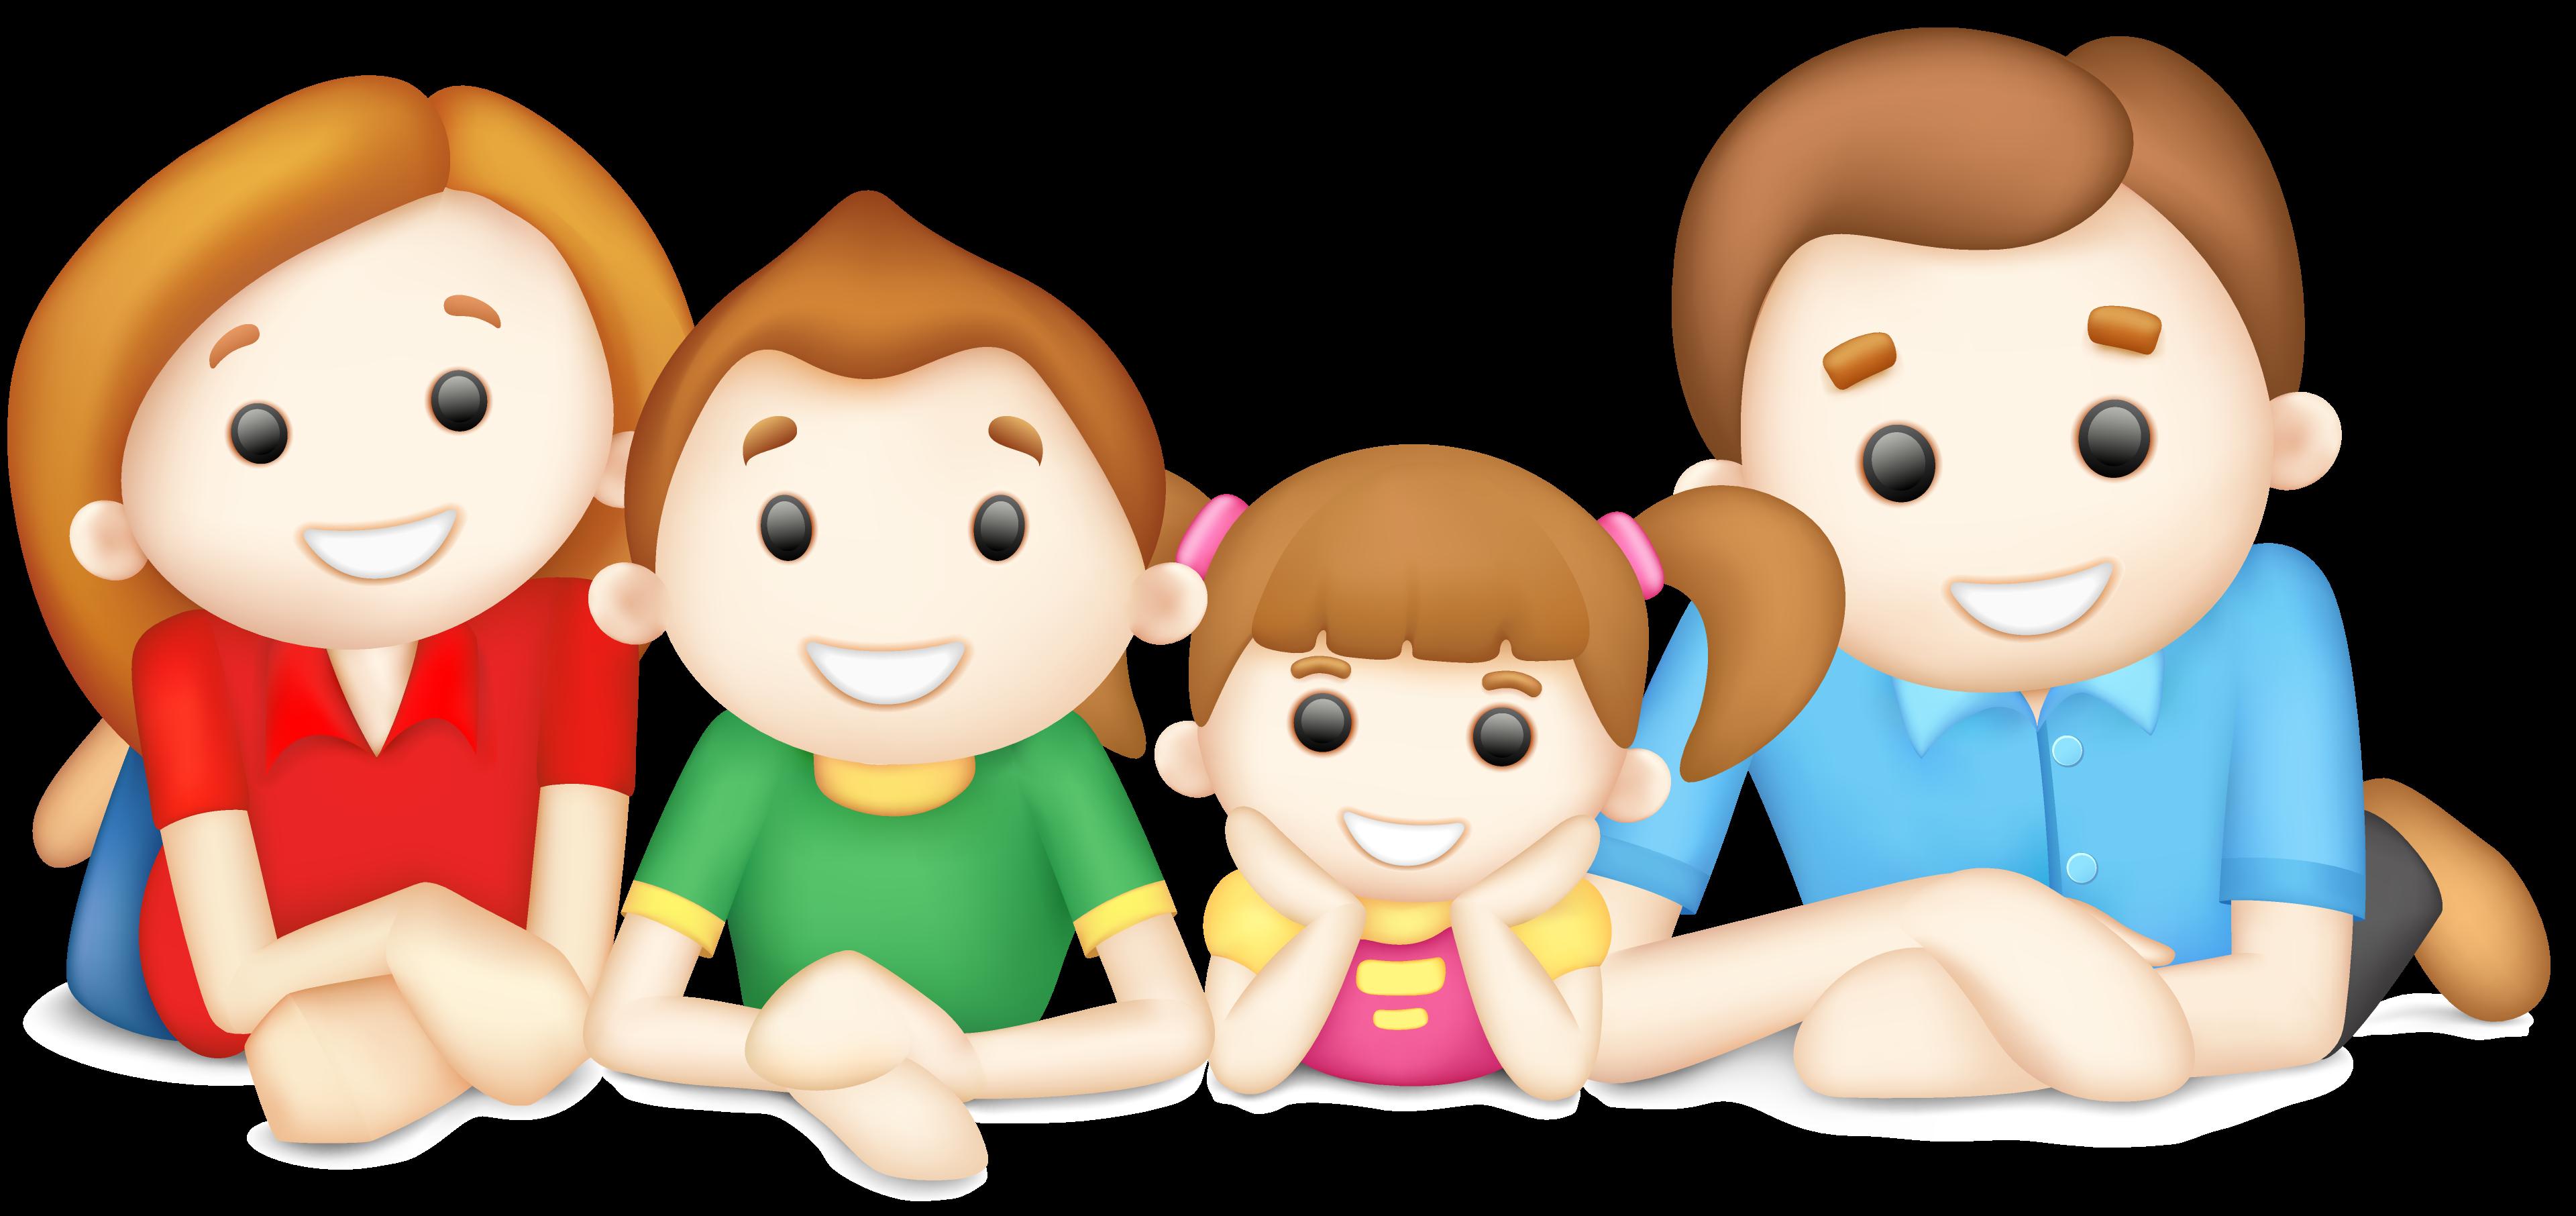 pinterest. Families clipart happy family